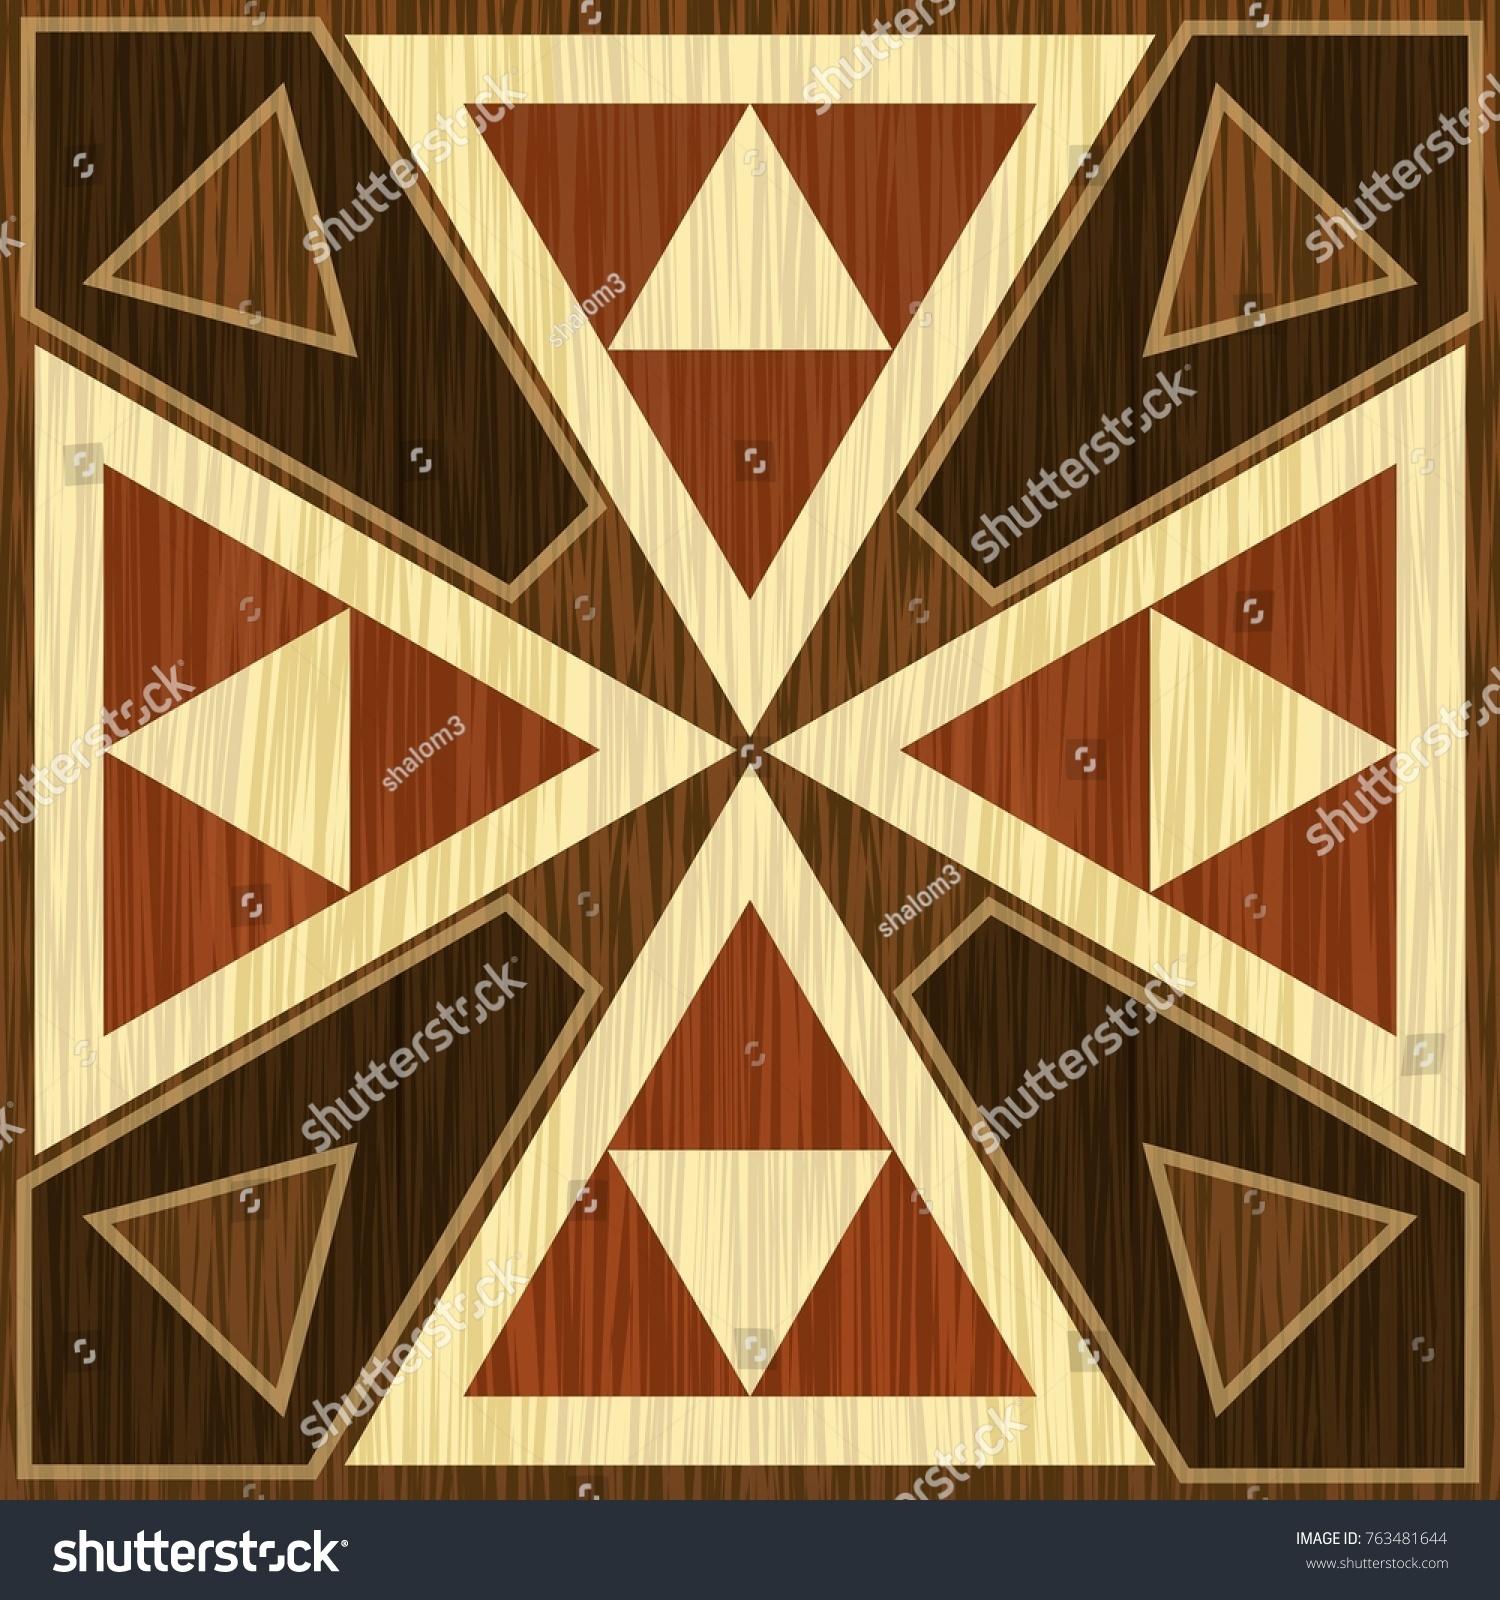 Wooden Inlay Light Dark Triangle Patterns Stock Photo (Photo, Vector ...